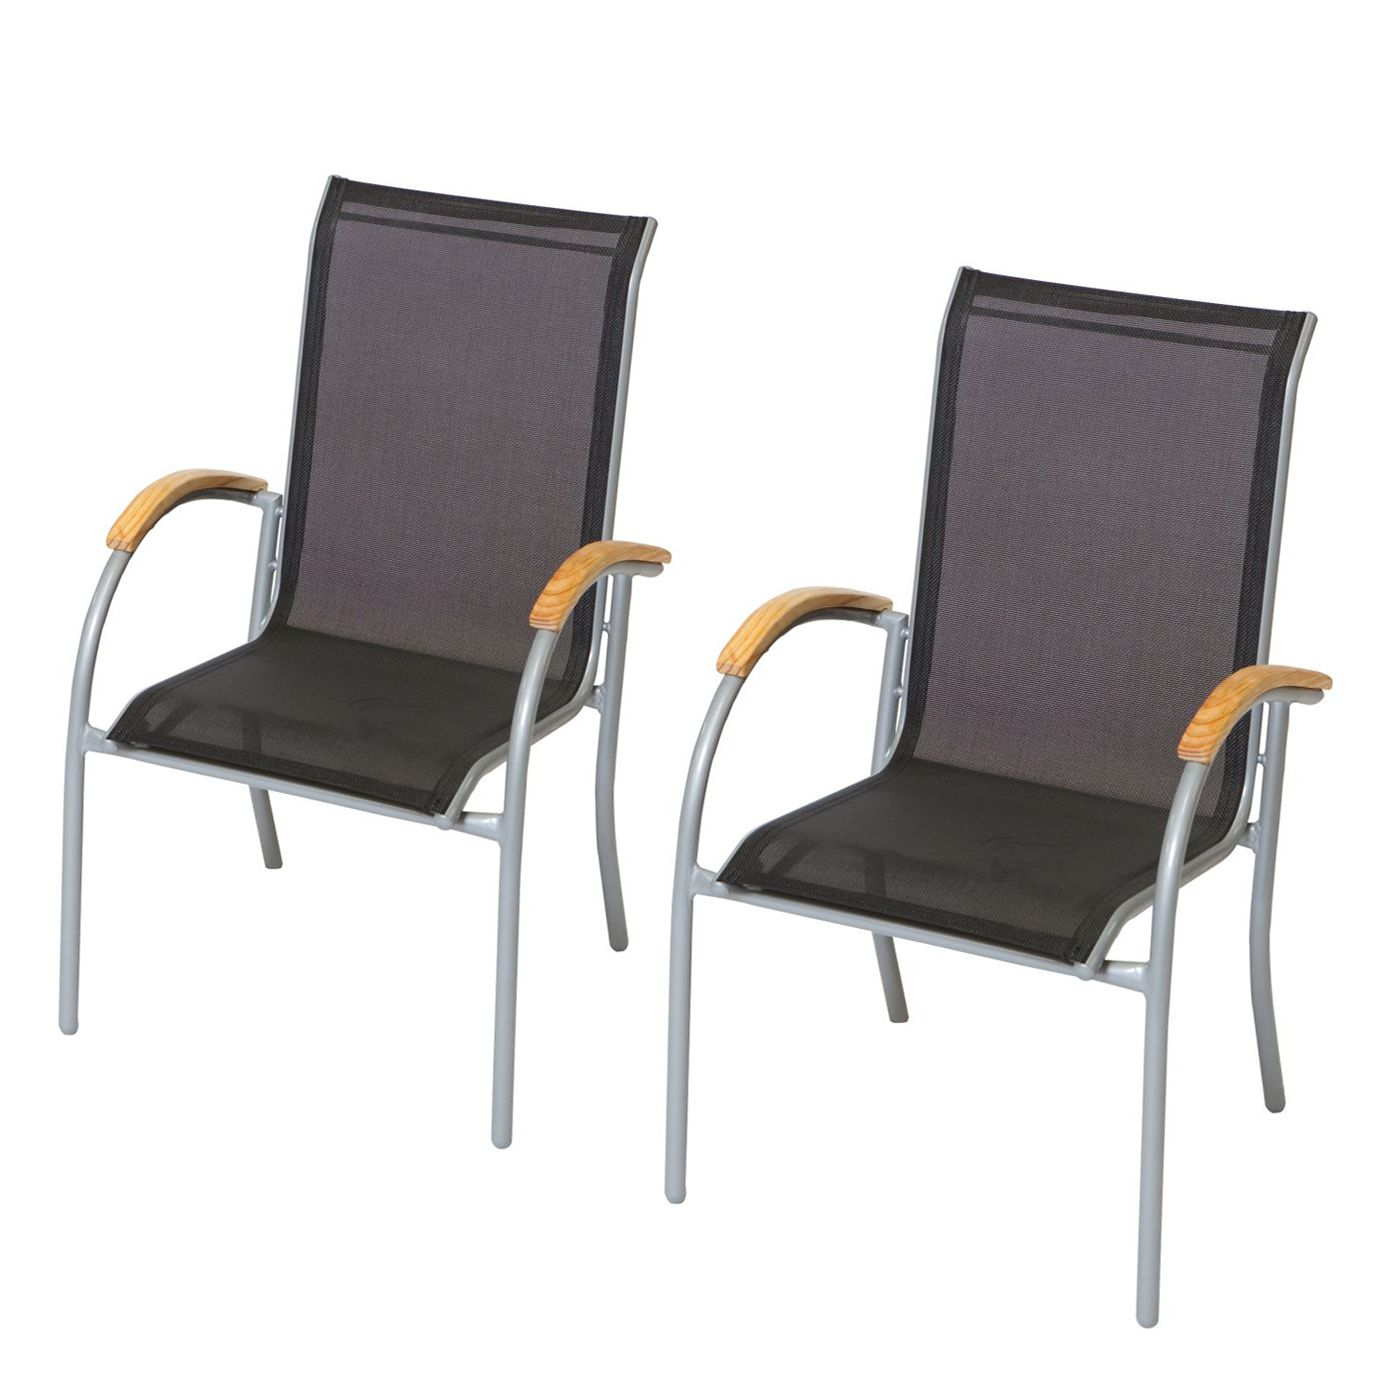 stapelsessel siena 2er set aluminium textilene. Black Bedroom Furniture Sets. Home Design Ideas